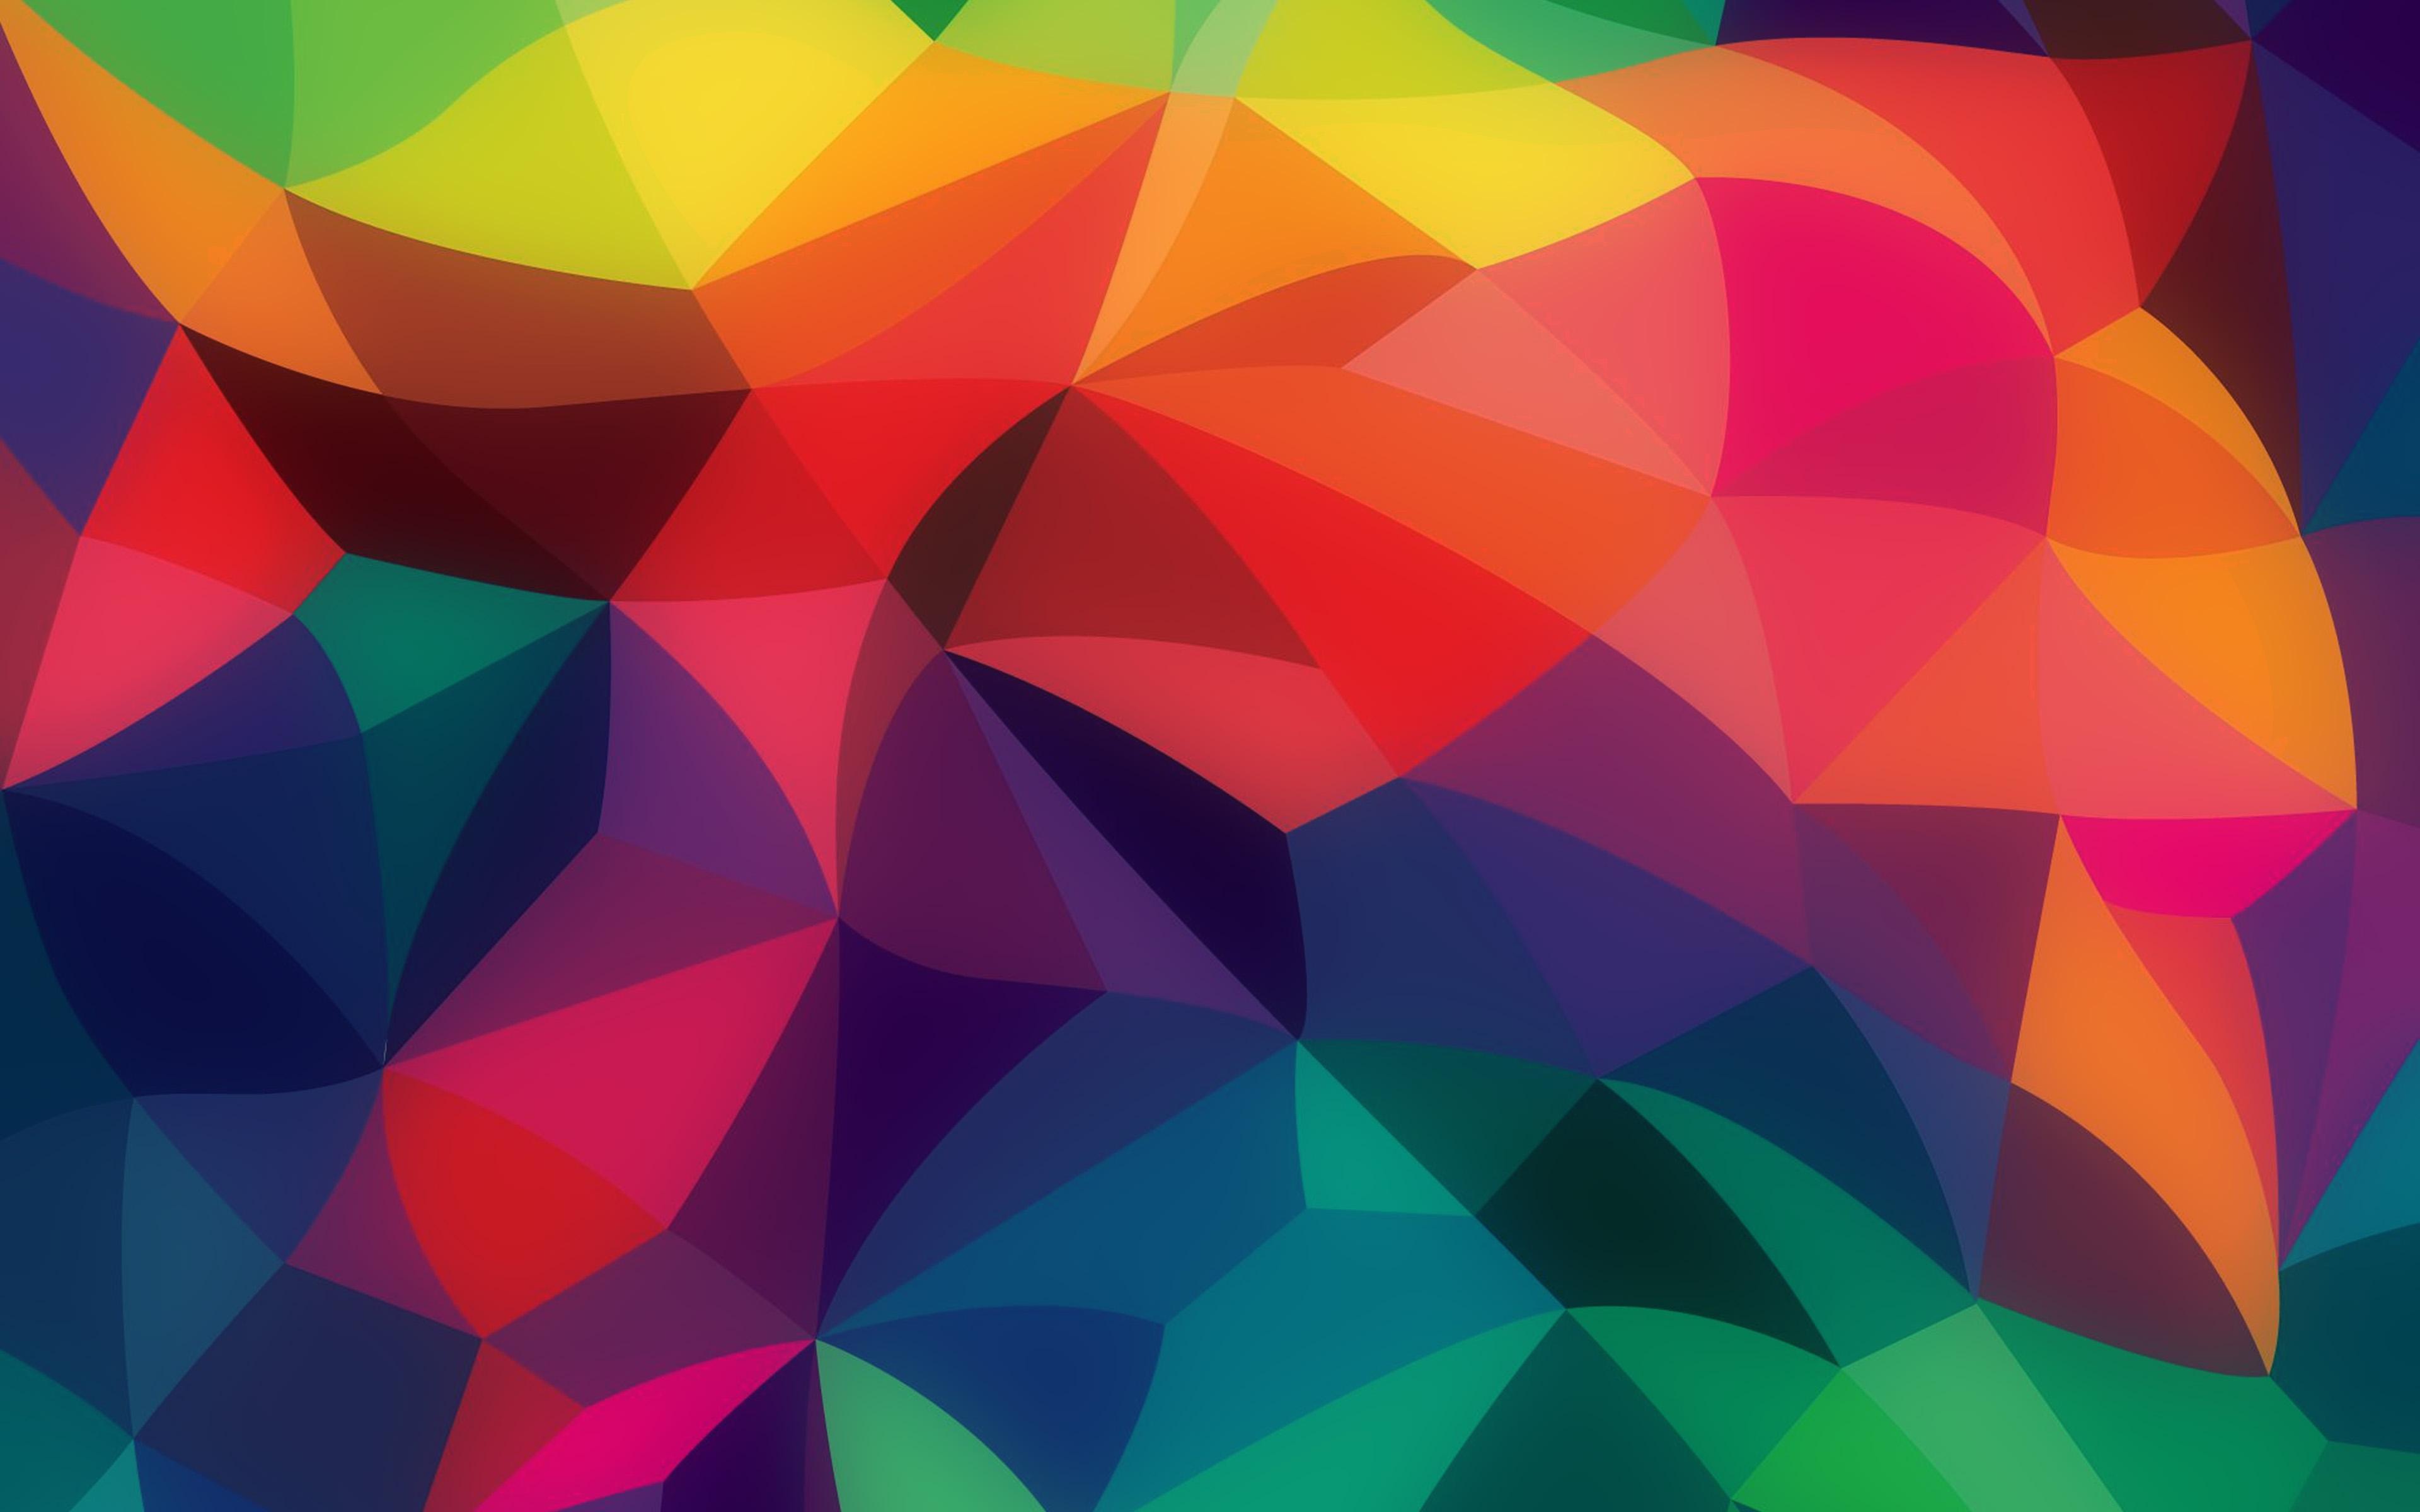 Rain Fall Hd Wallpaper Vk42 Rainbow Abstract Colors Pastel Dark Pattern Wallpaper